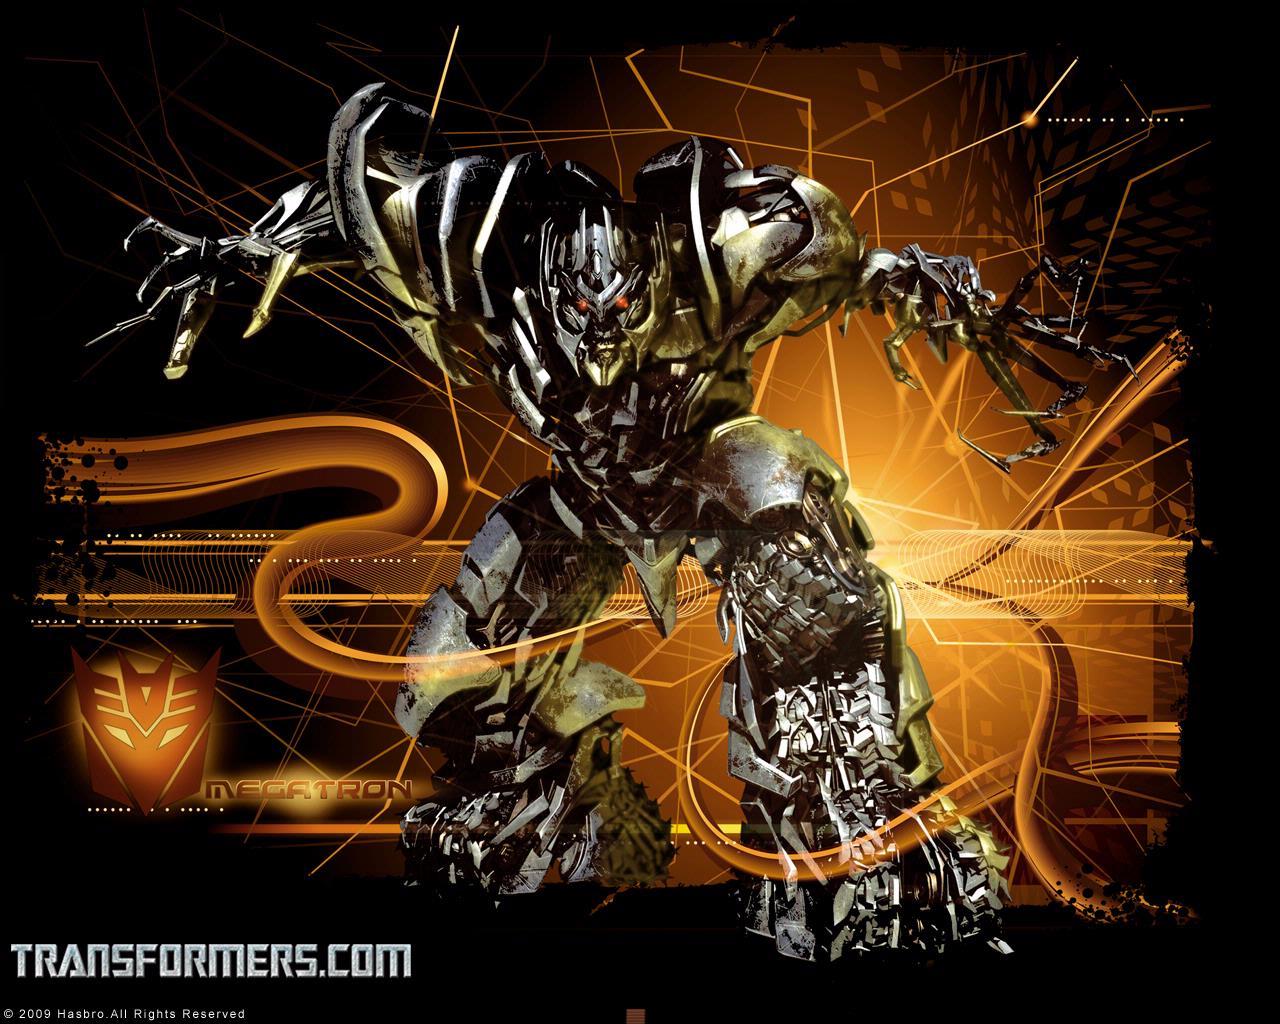 http://4.bp.blogspot.com/-VVjpozPQ-0k/UZRVmU2bMYI/AAAAAAAAyYU/BAruQWFirTQ/s1600/Transformers+Wallpapers+(15).jpg